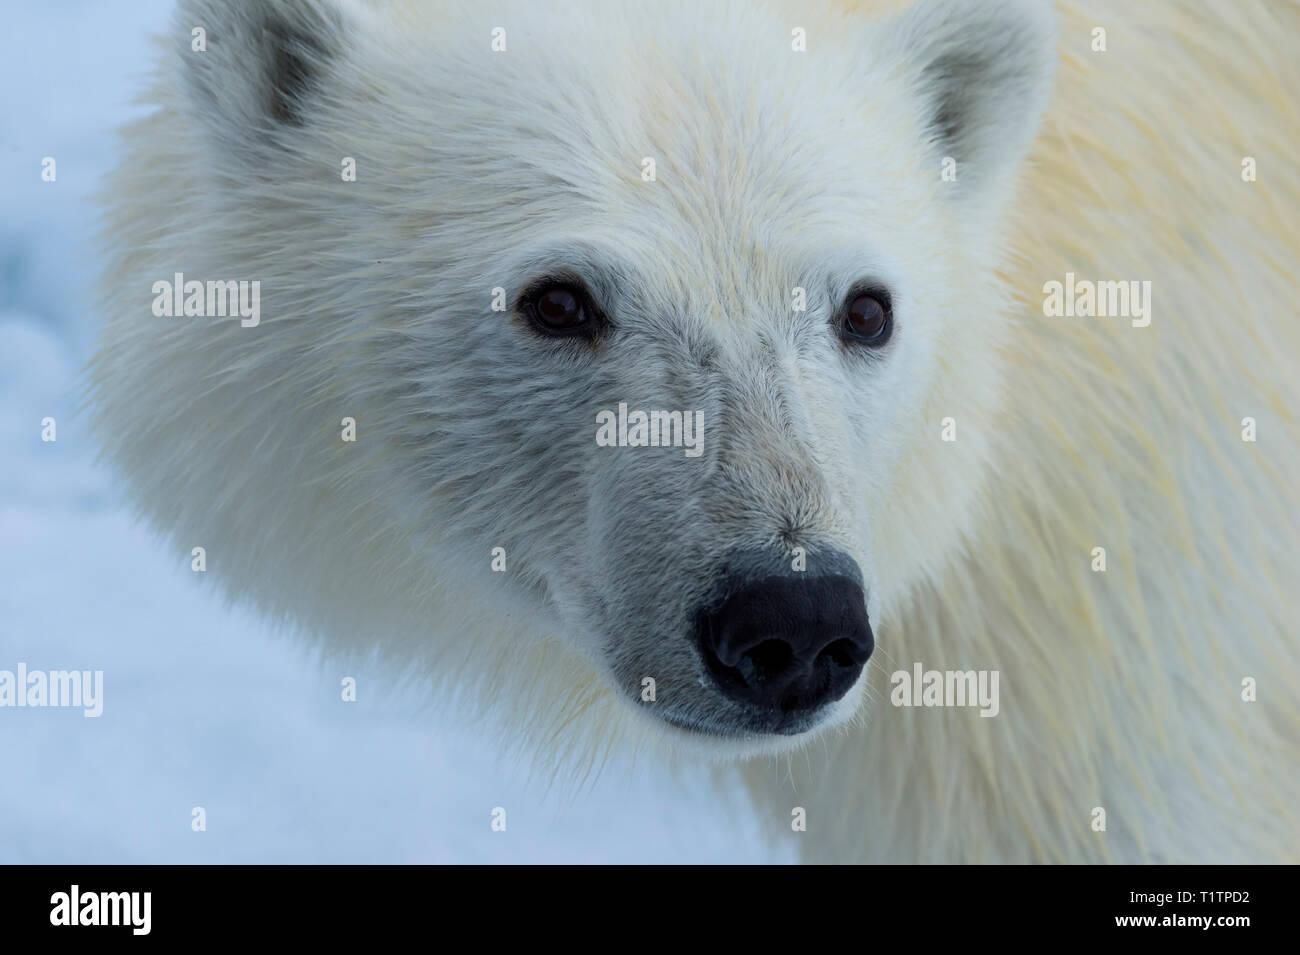 Polar Bear, Svalbard Archipelago, Norway - Stock Image